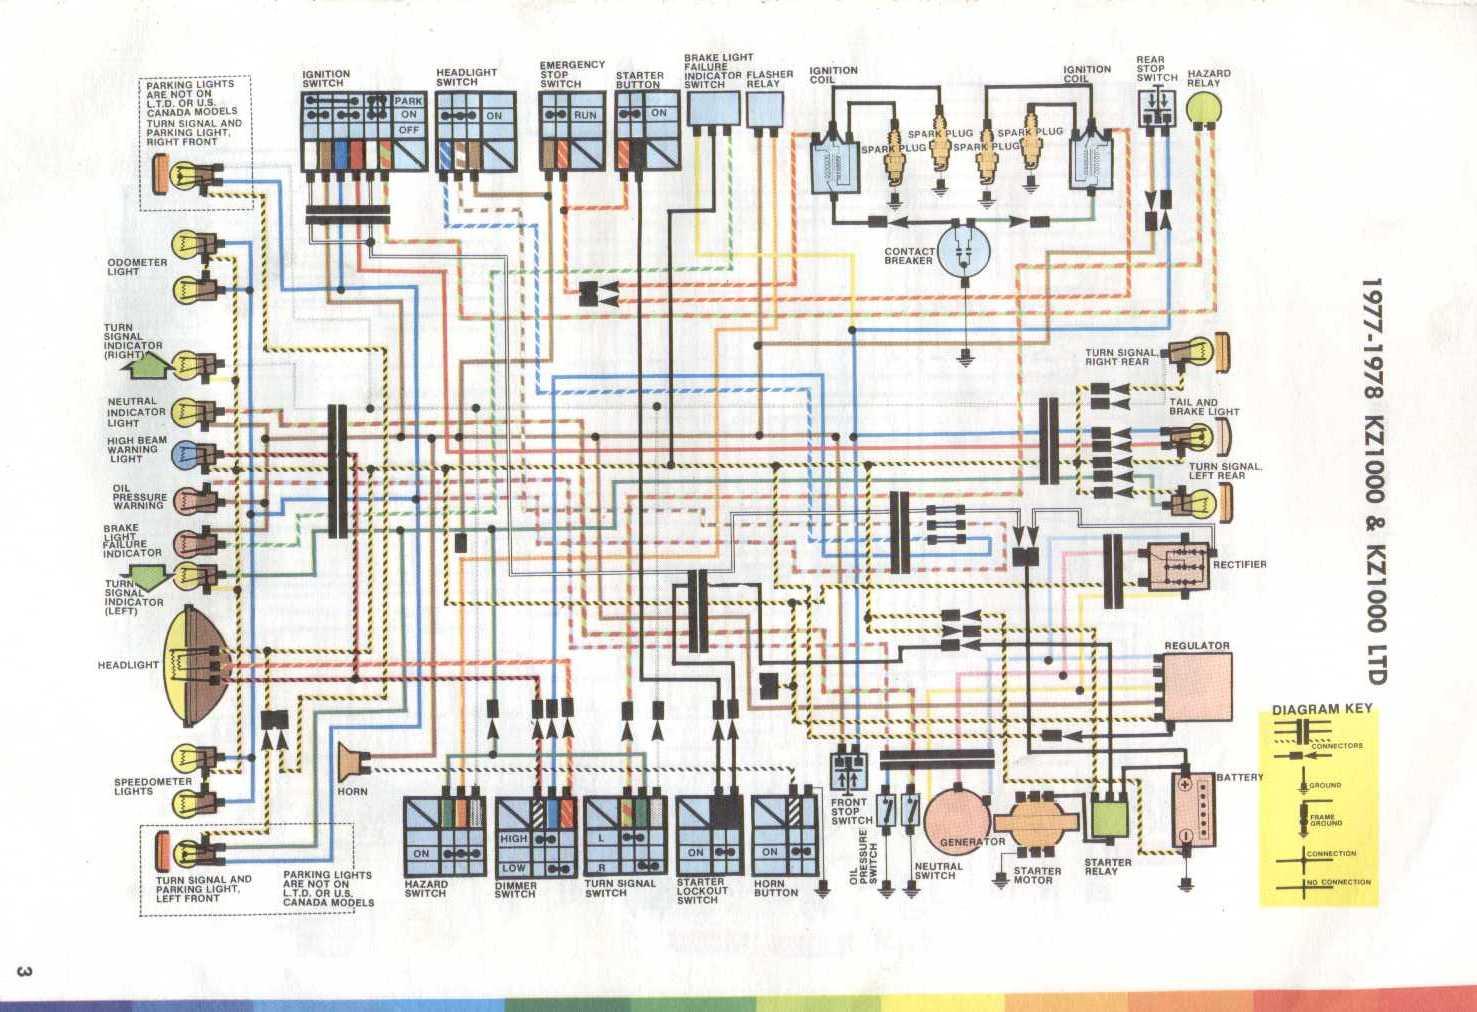 1978 kawasaki z1000 wiring diagram wiring diagram z4 rh 6 mkop biologiethemenabitur de